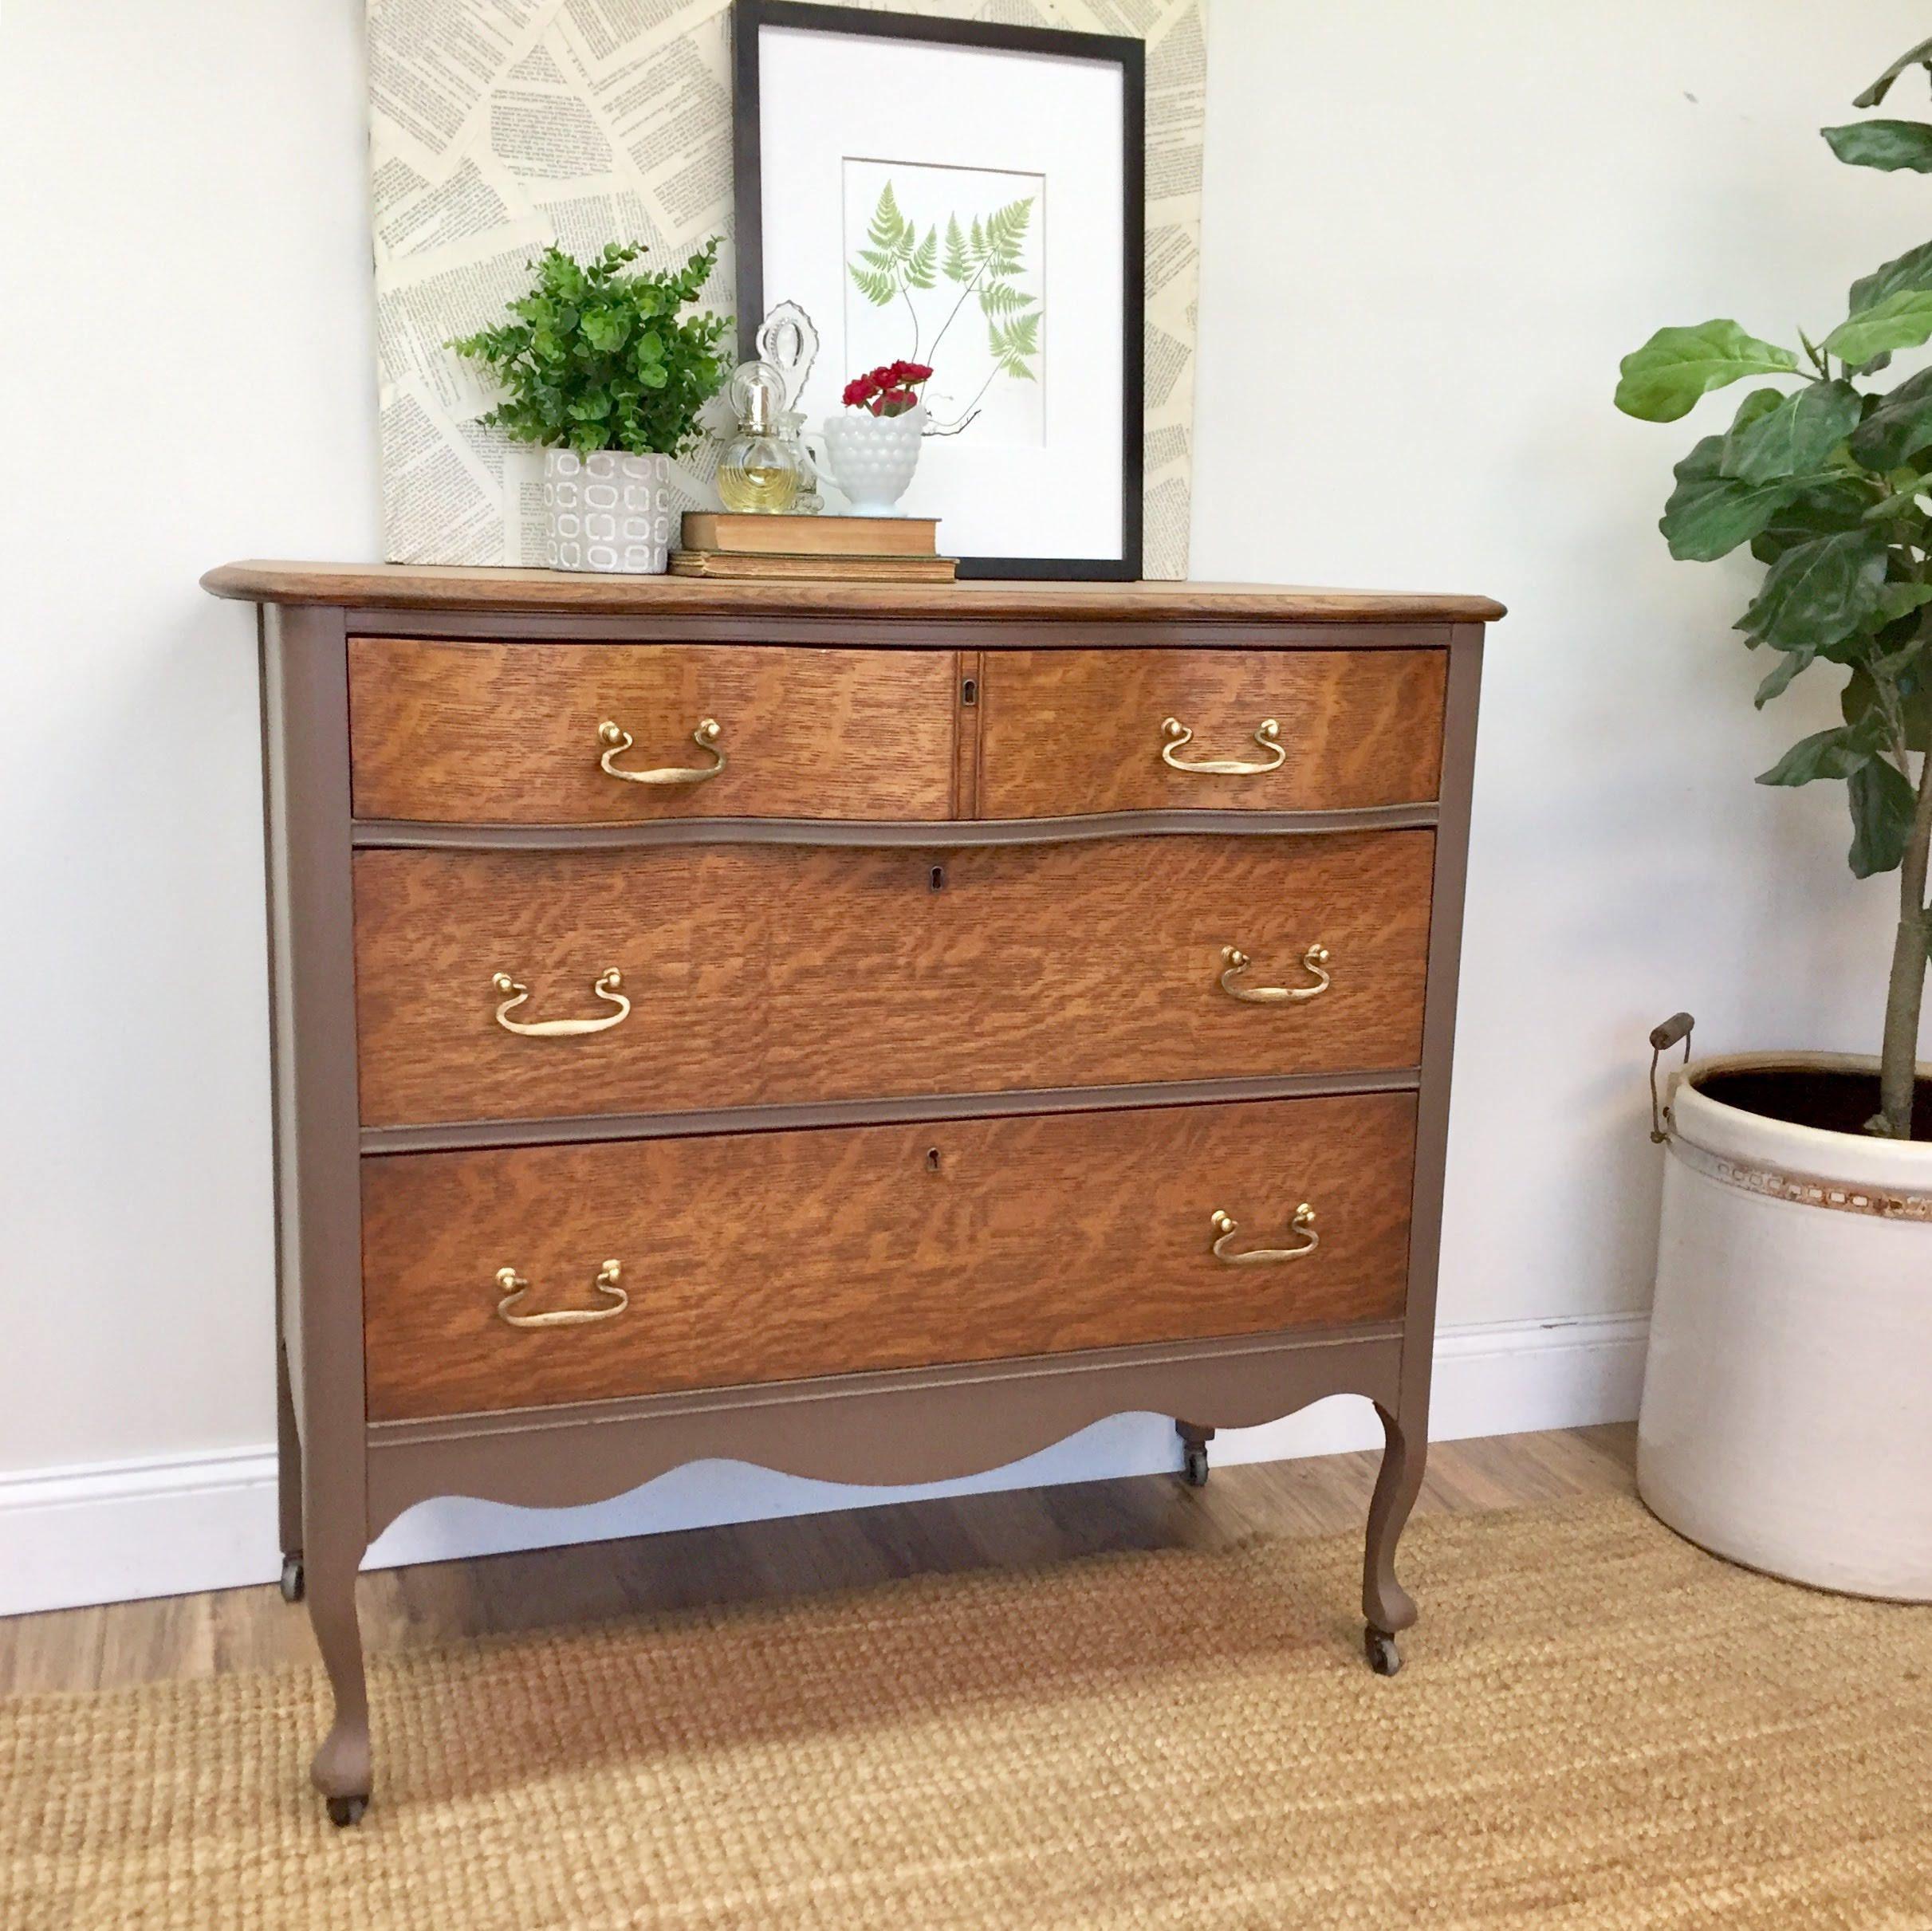 Antique Oak Dresser Refinished Furniture Furniture